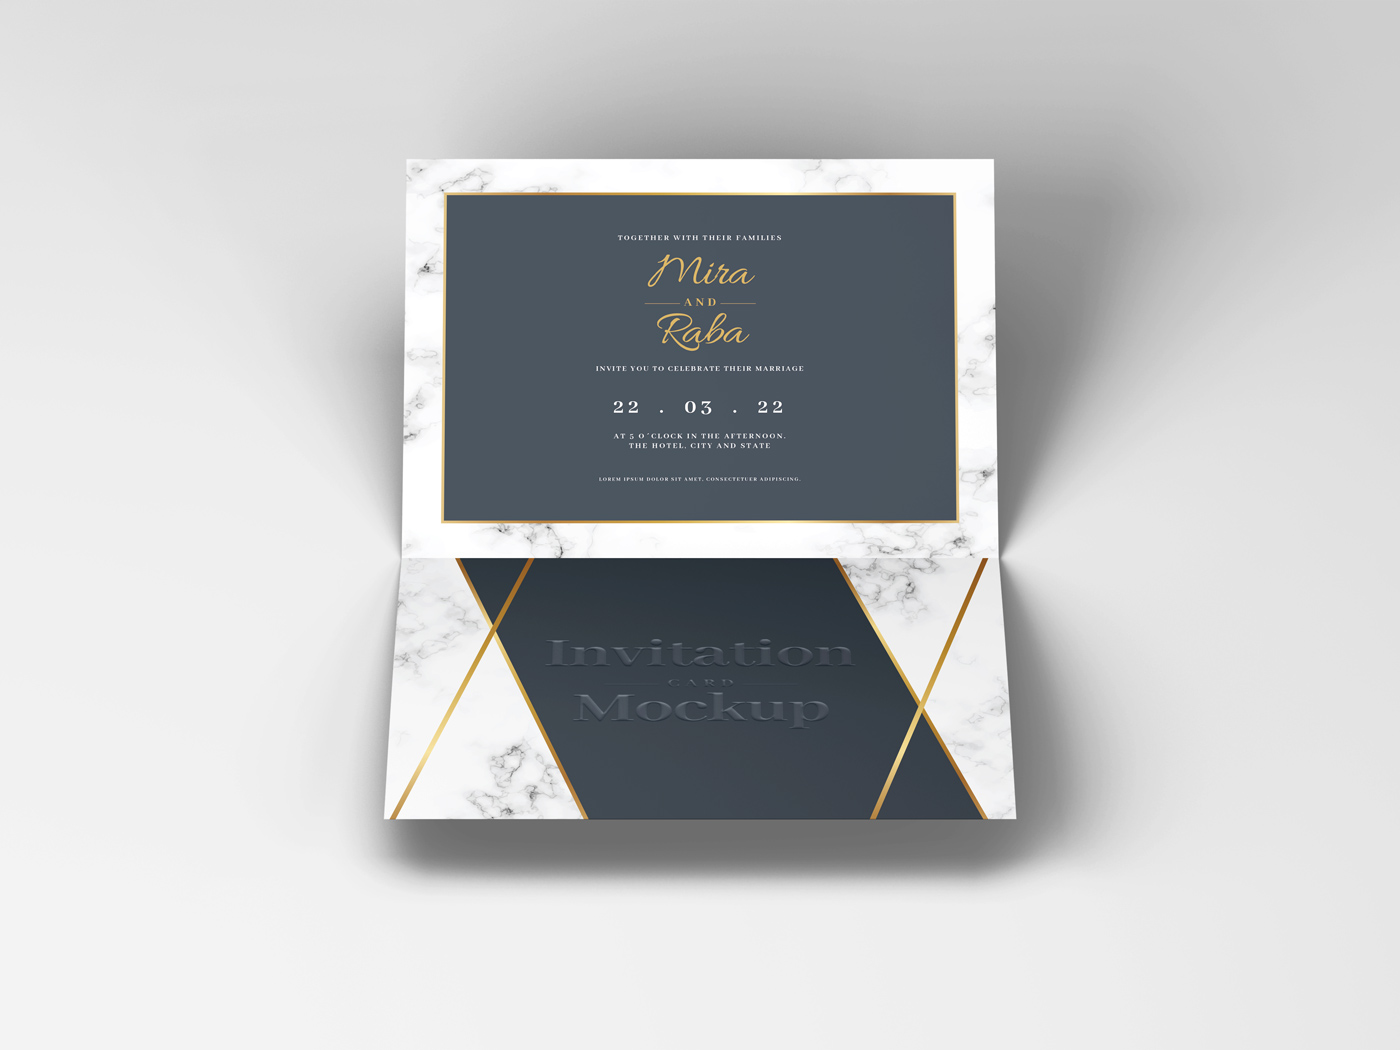 Invitation Card Mockups V1 example image 3